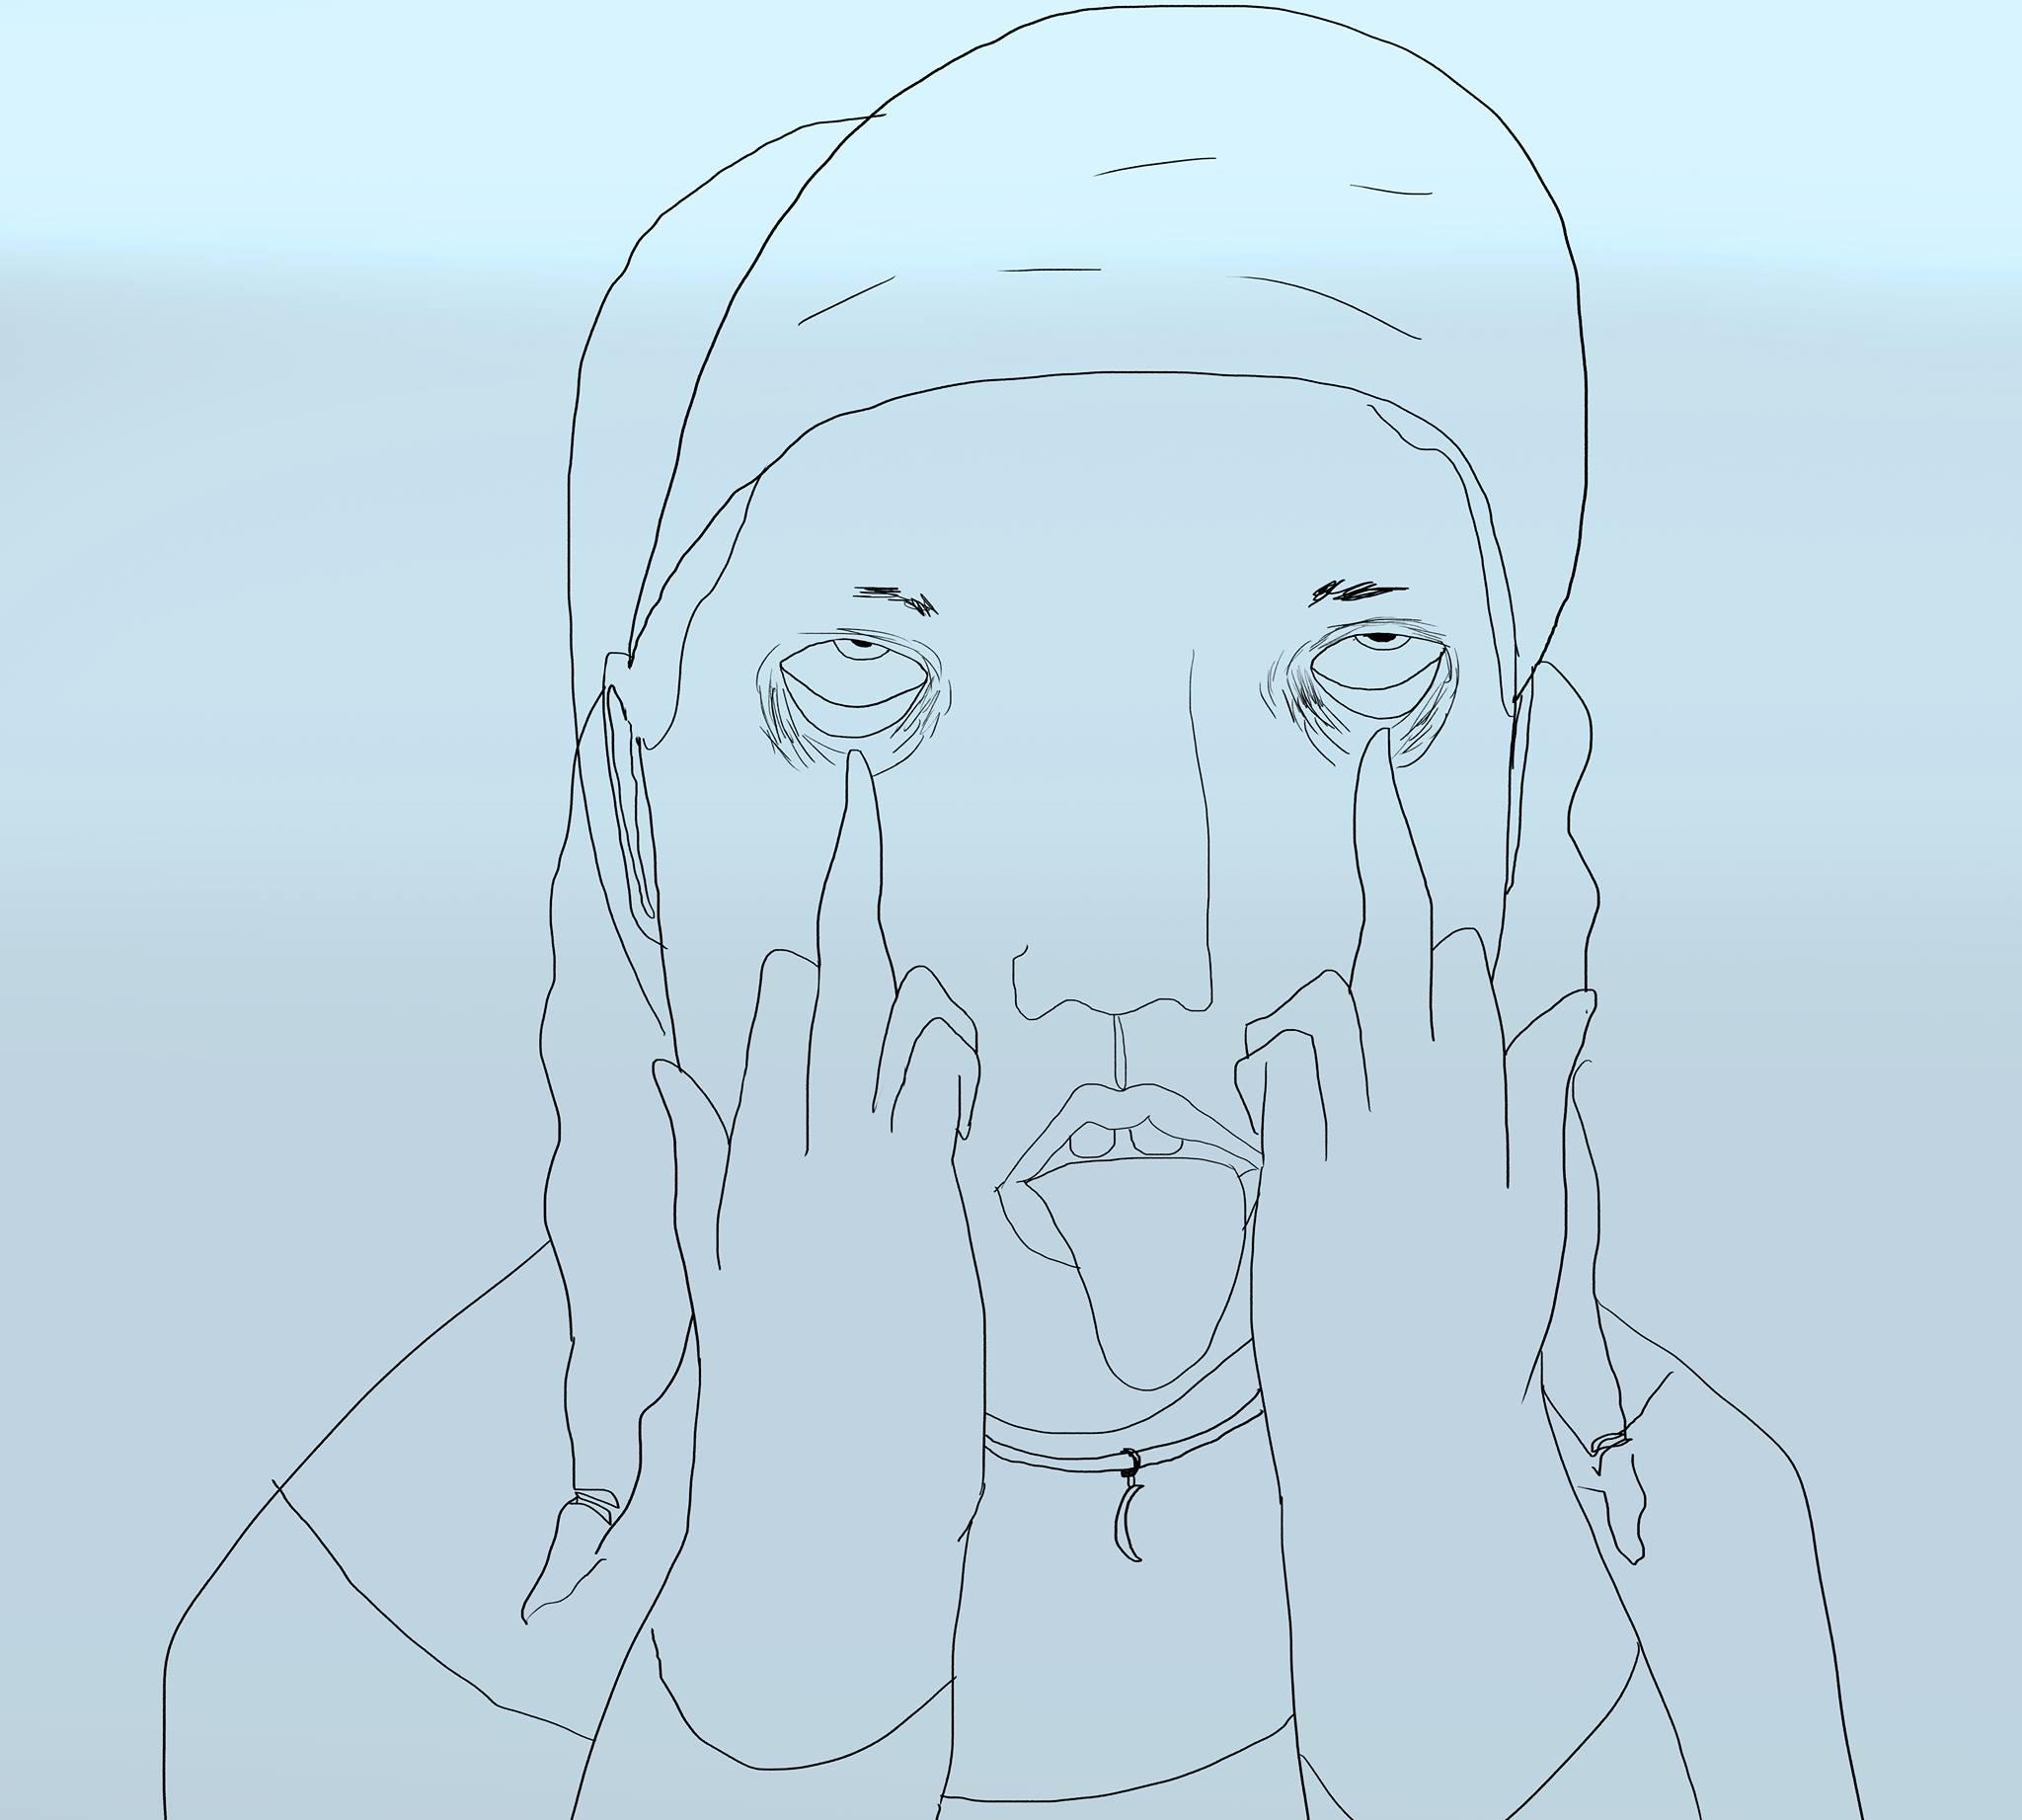 real tired day job - art, illustration - missjaws | ello